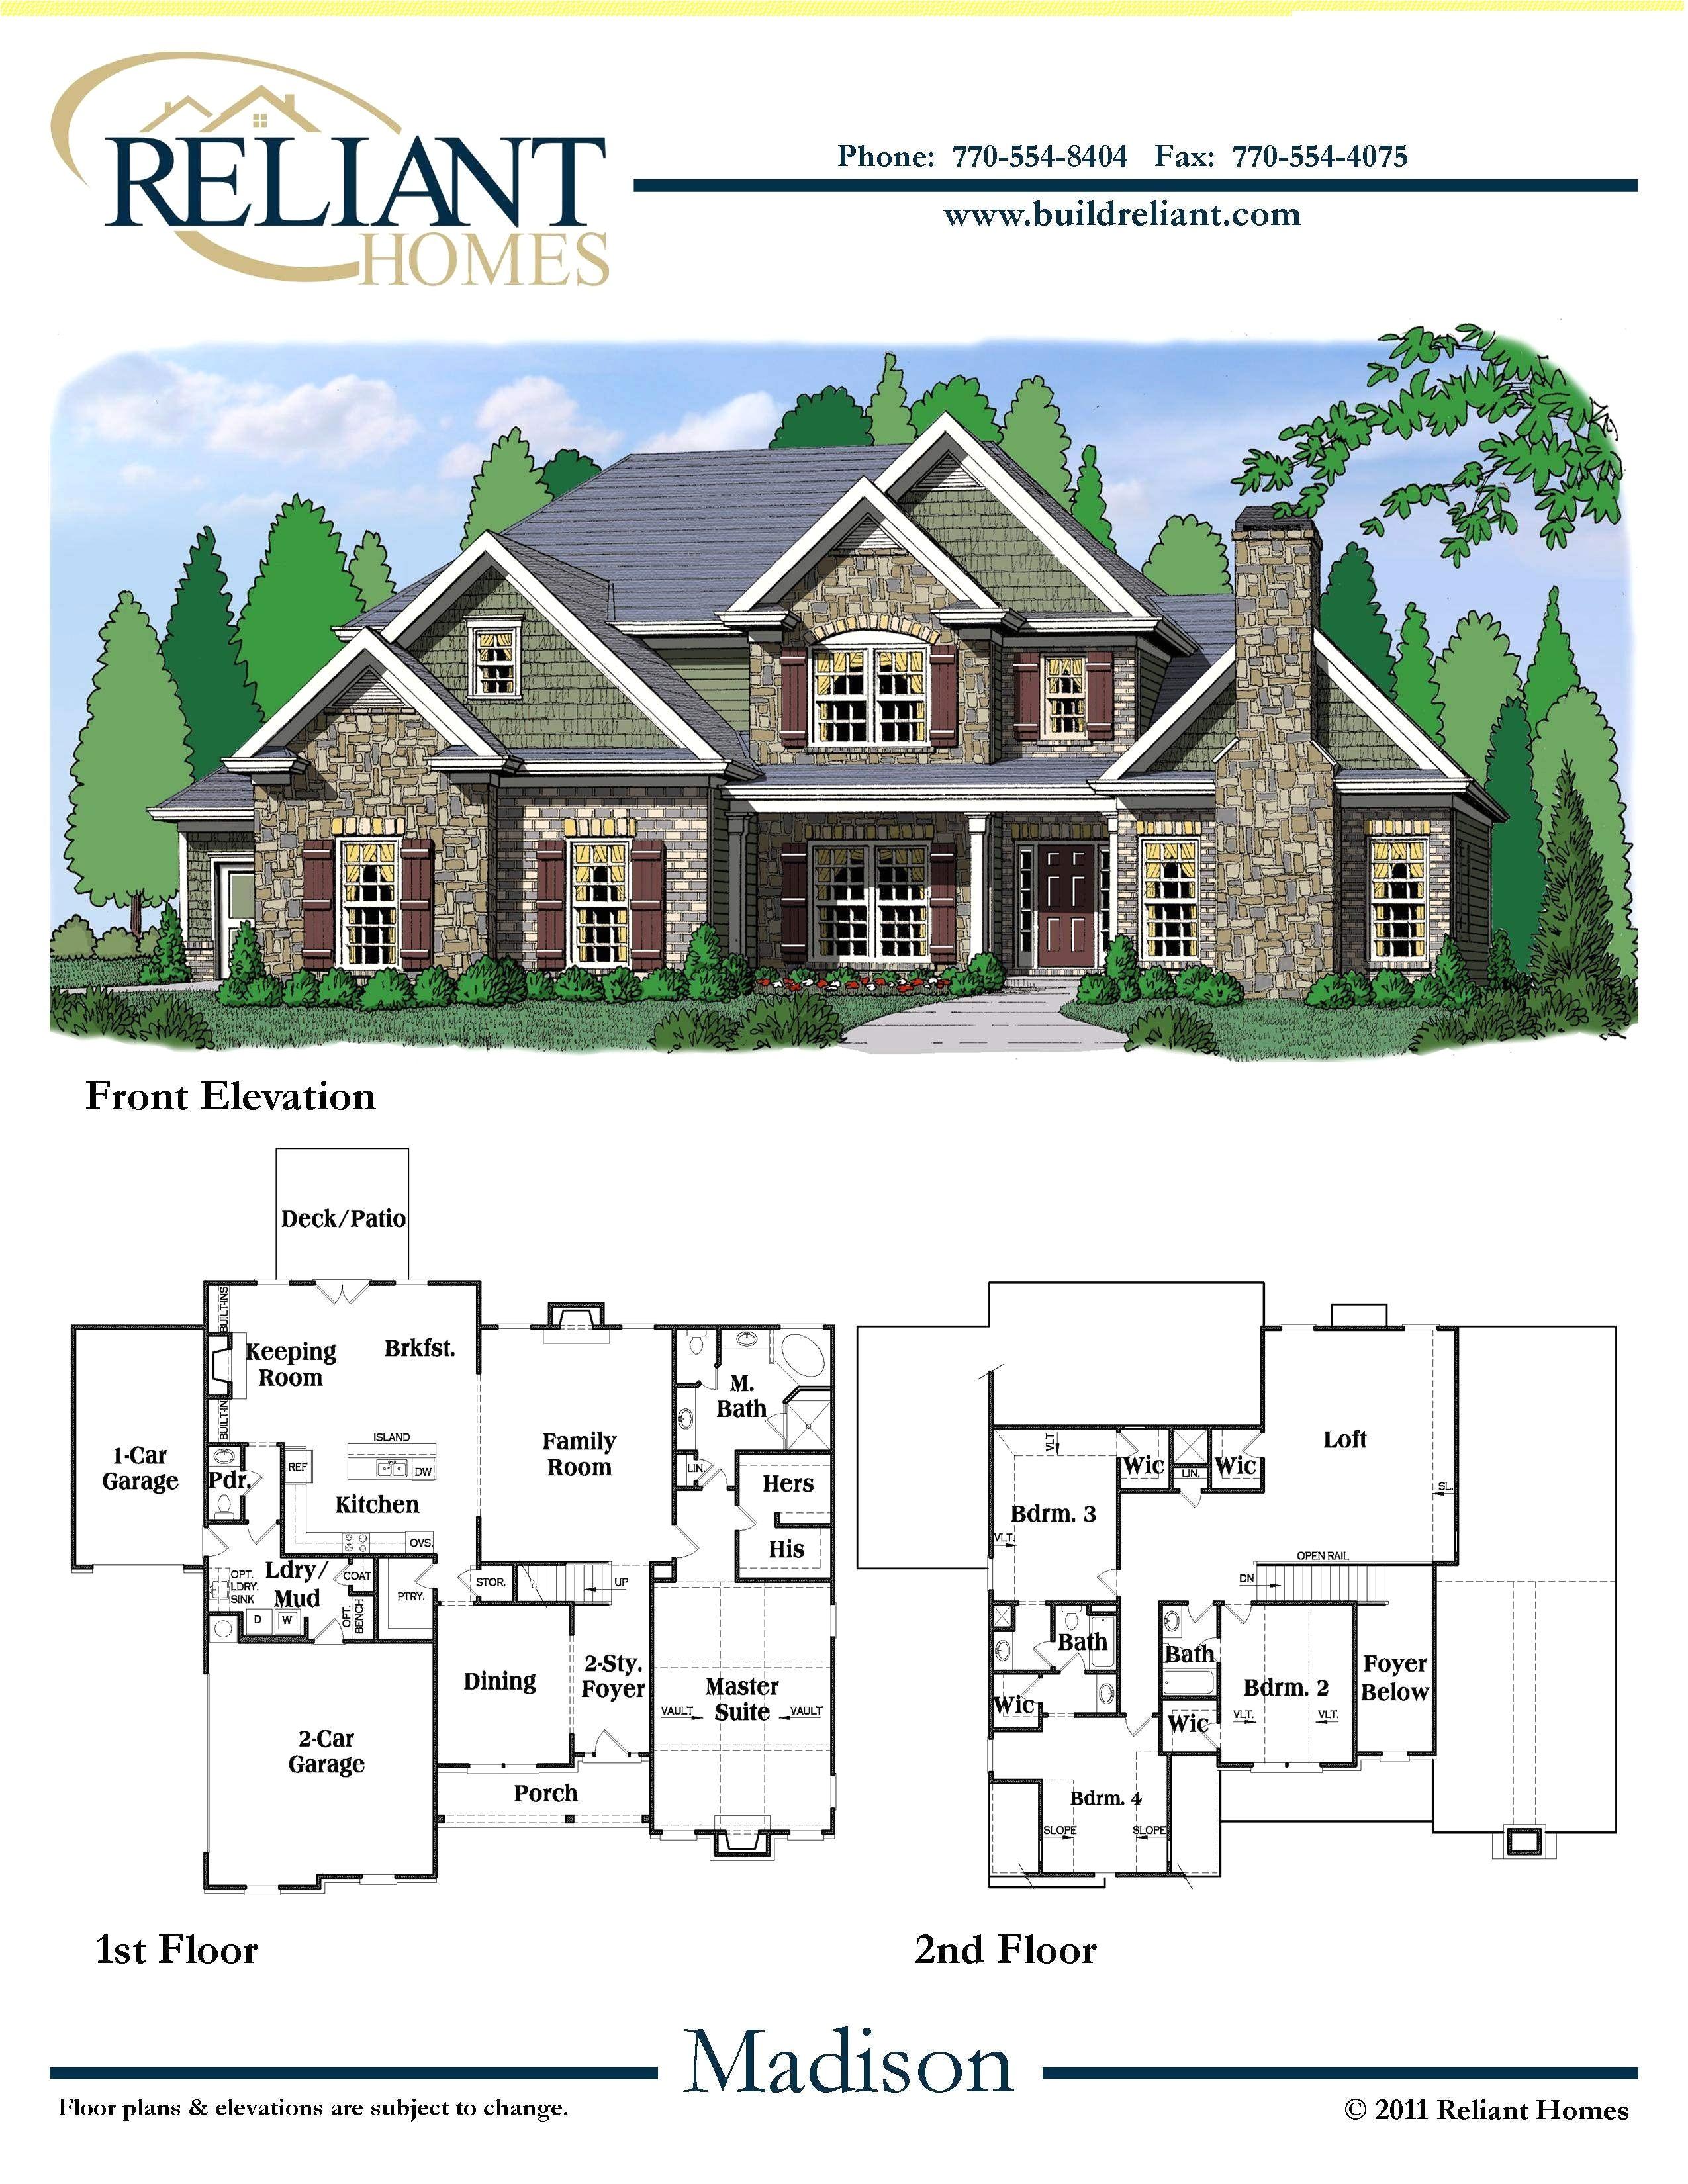 ryland homes floor plans inspirational madison floor plan ryland homes home plan